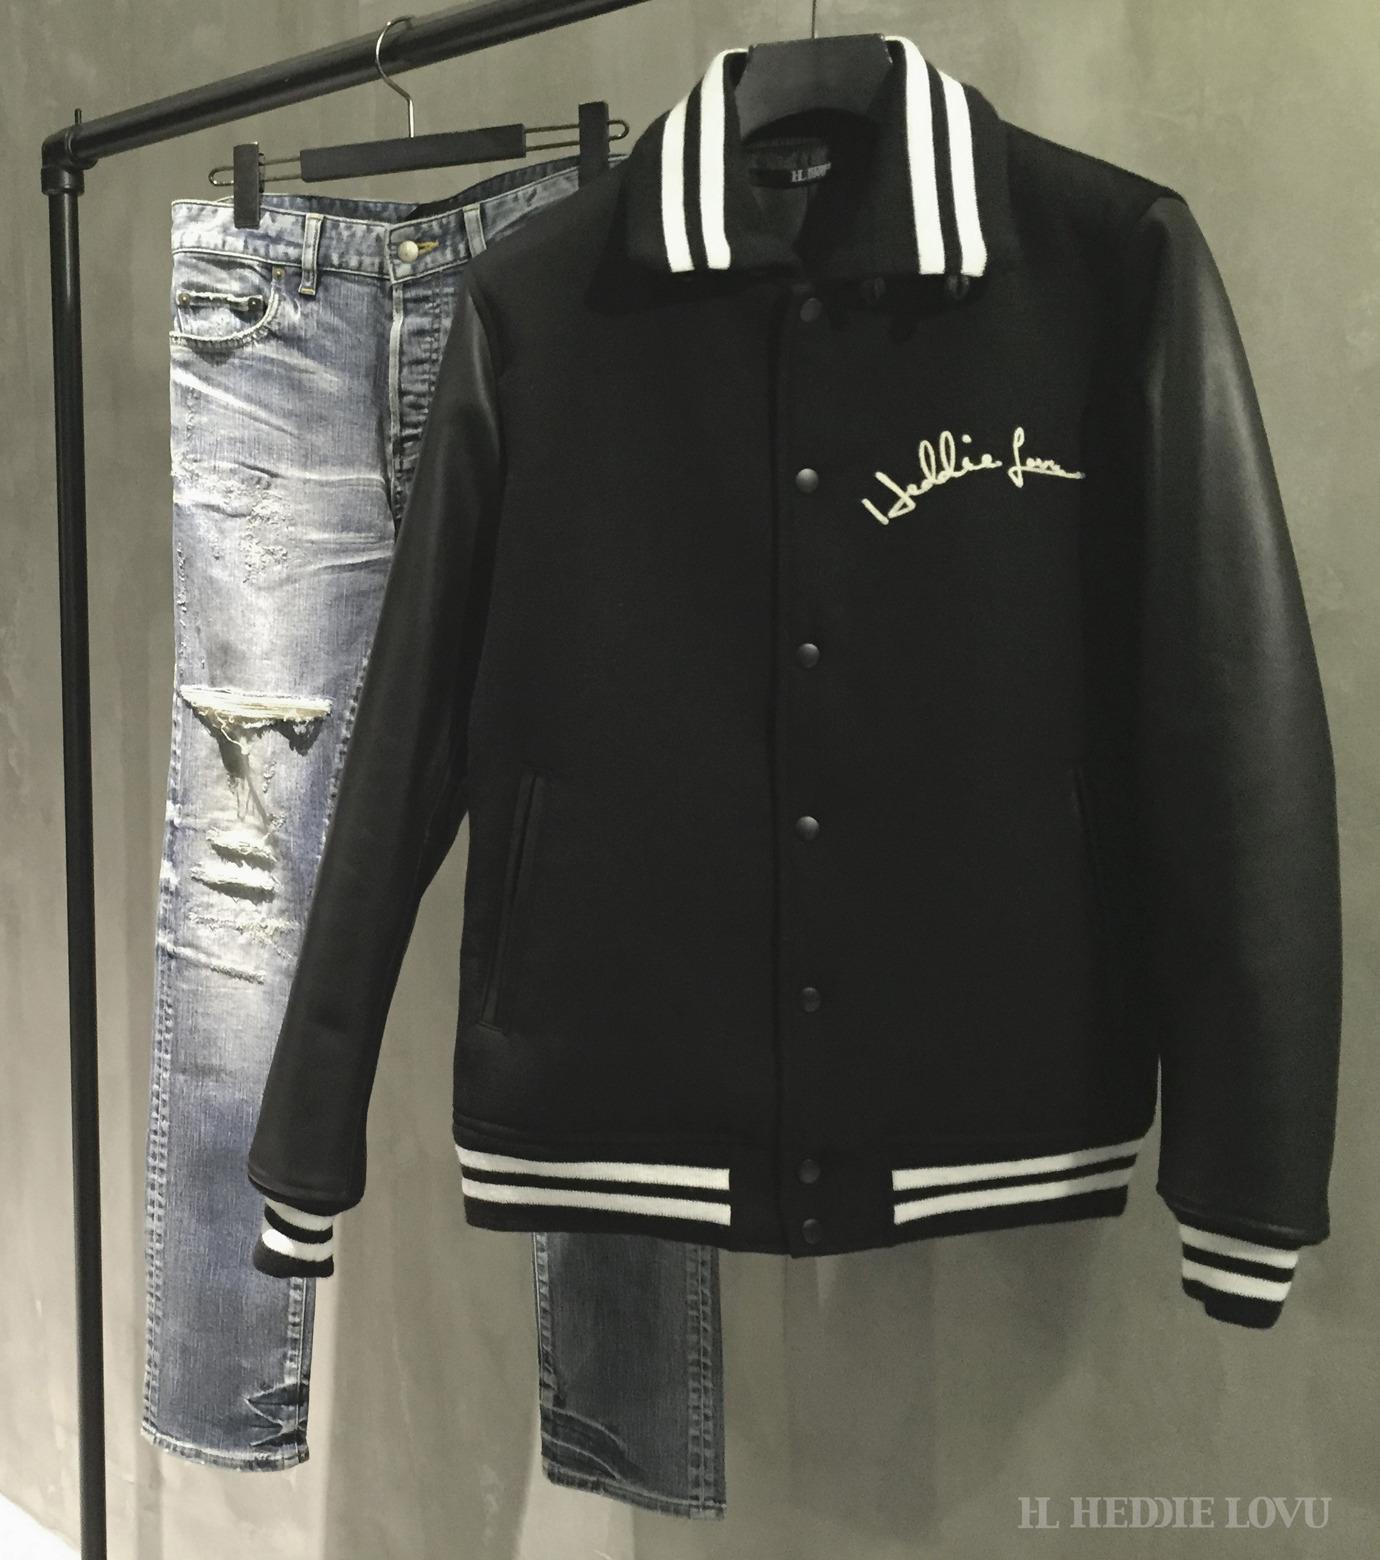 HL HEDDIE LOVU(エイチエル・エディールーヴ)のSTADIUM JACKET-BLACK(ジャケット/jacket)-18S94002-13 拡大詳細画像6